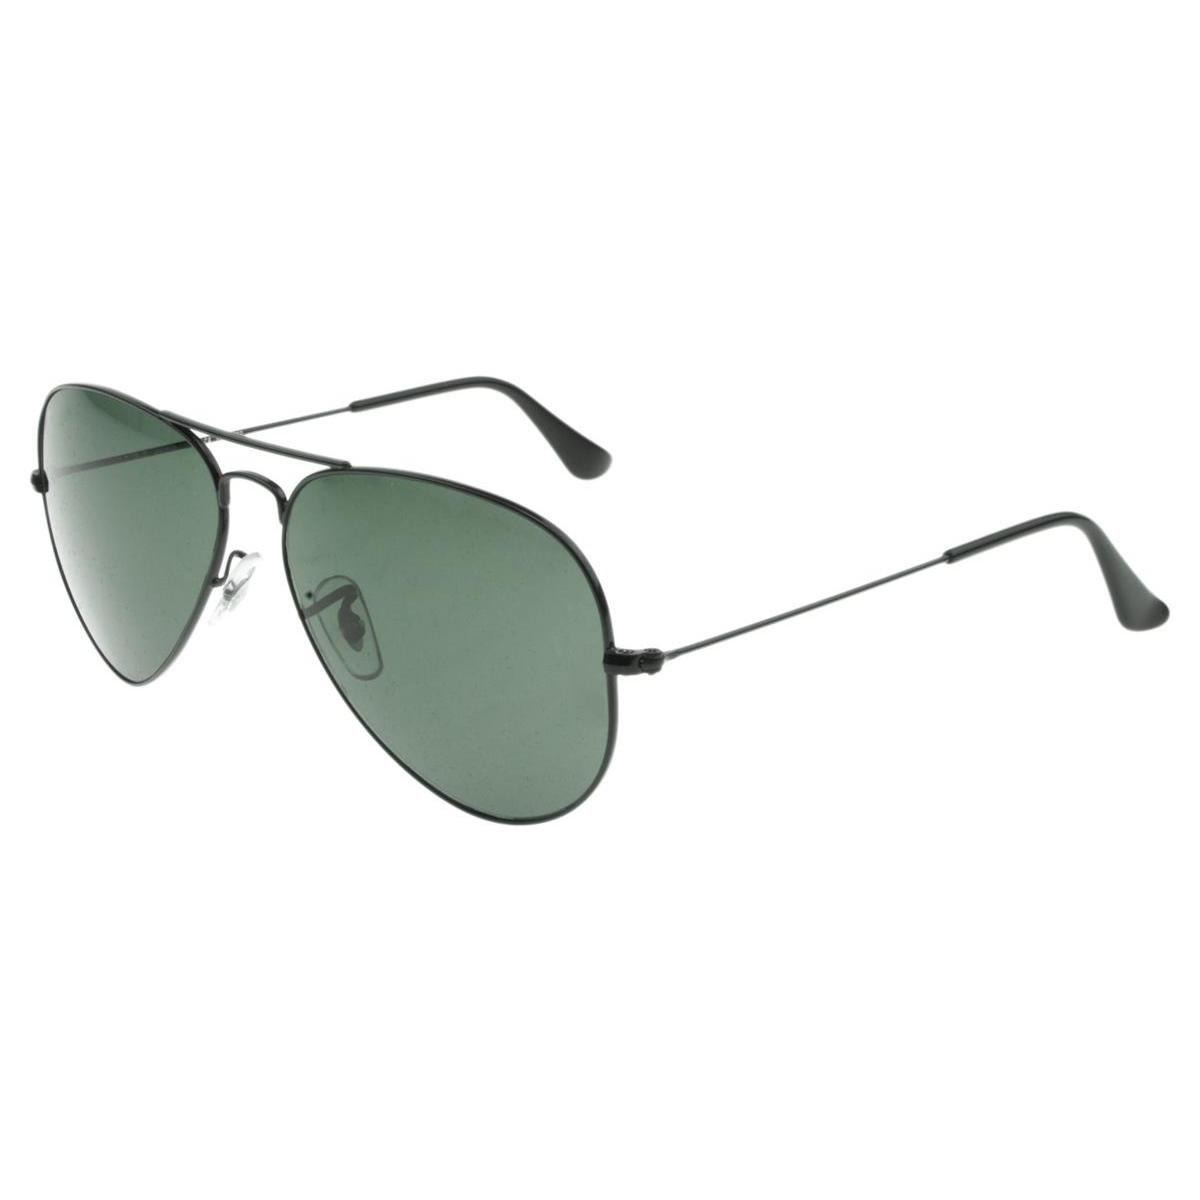 Óculos de Sol Ray-Ban Aviator RB3025 - 029-71 58 - Compre Agora ... 10dcf08c57